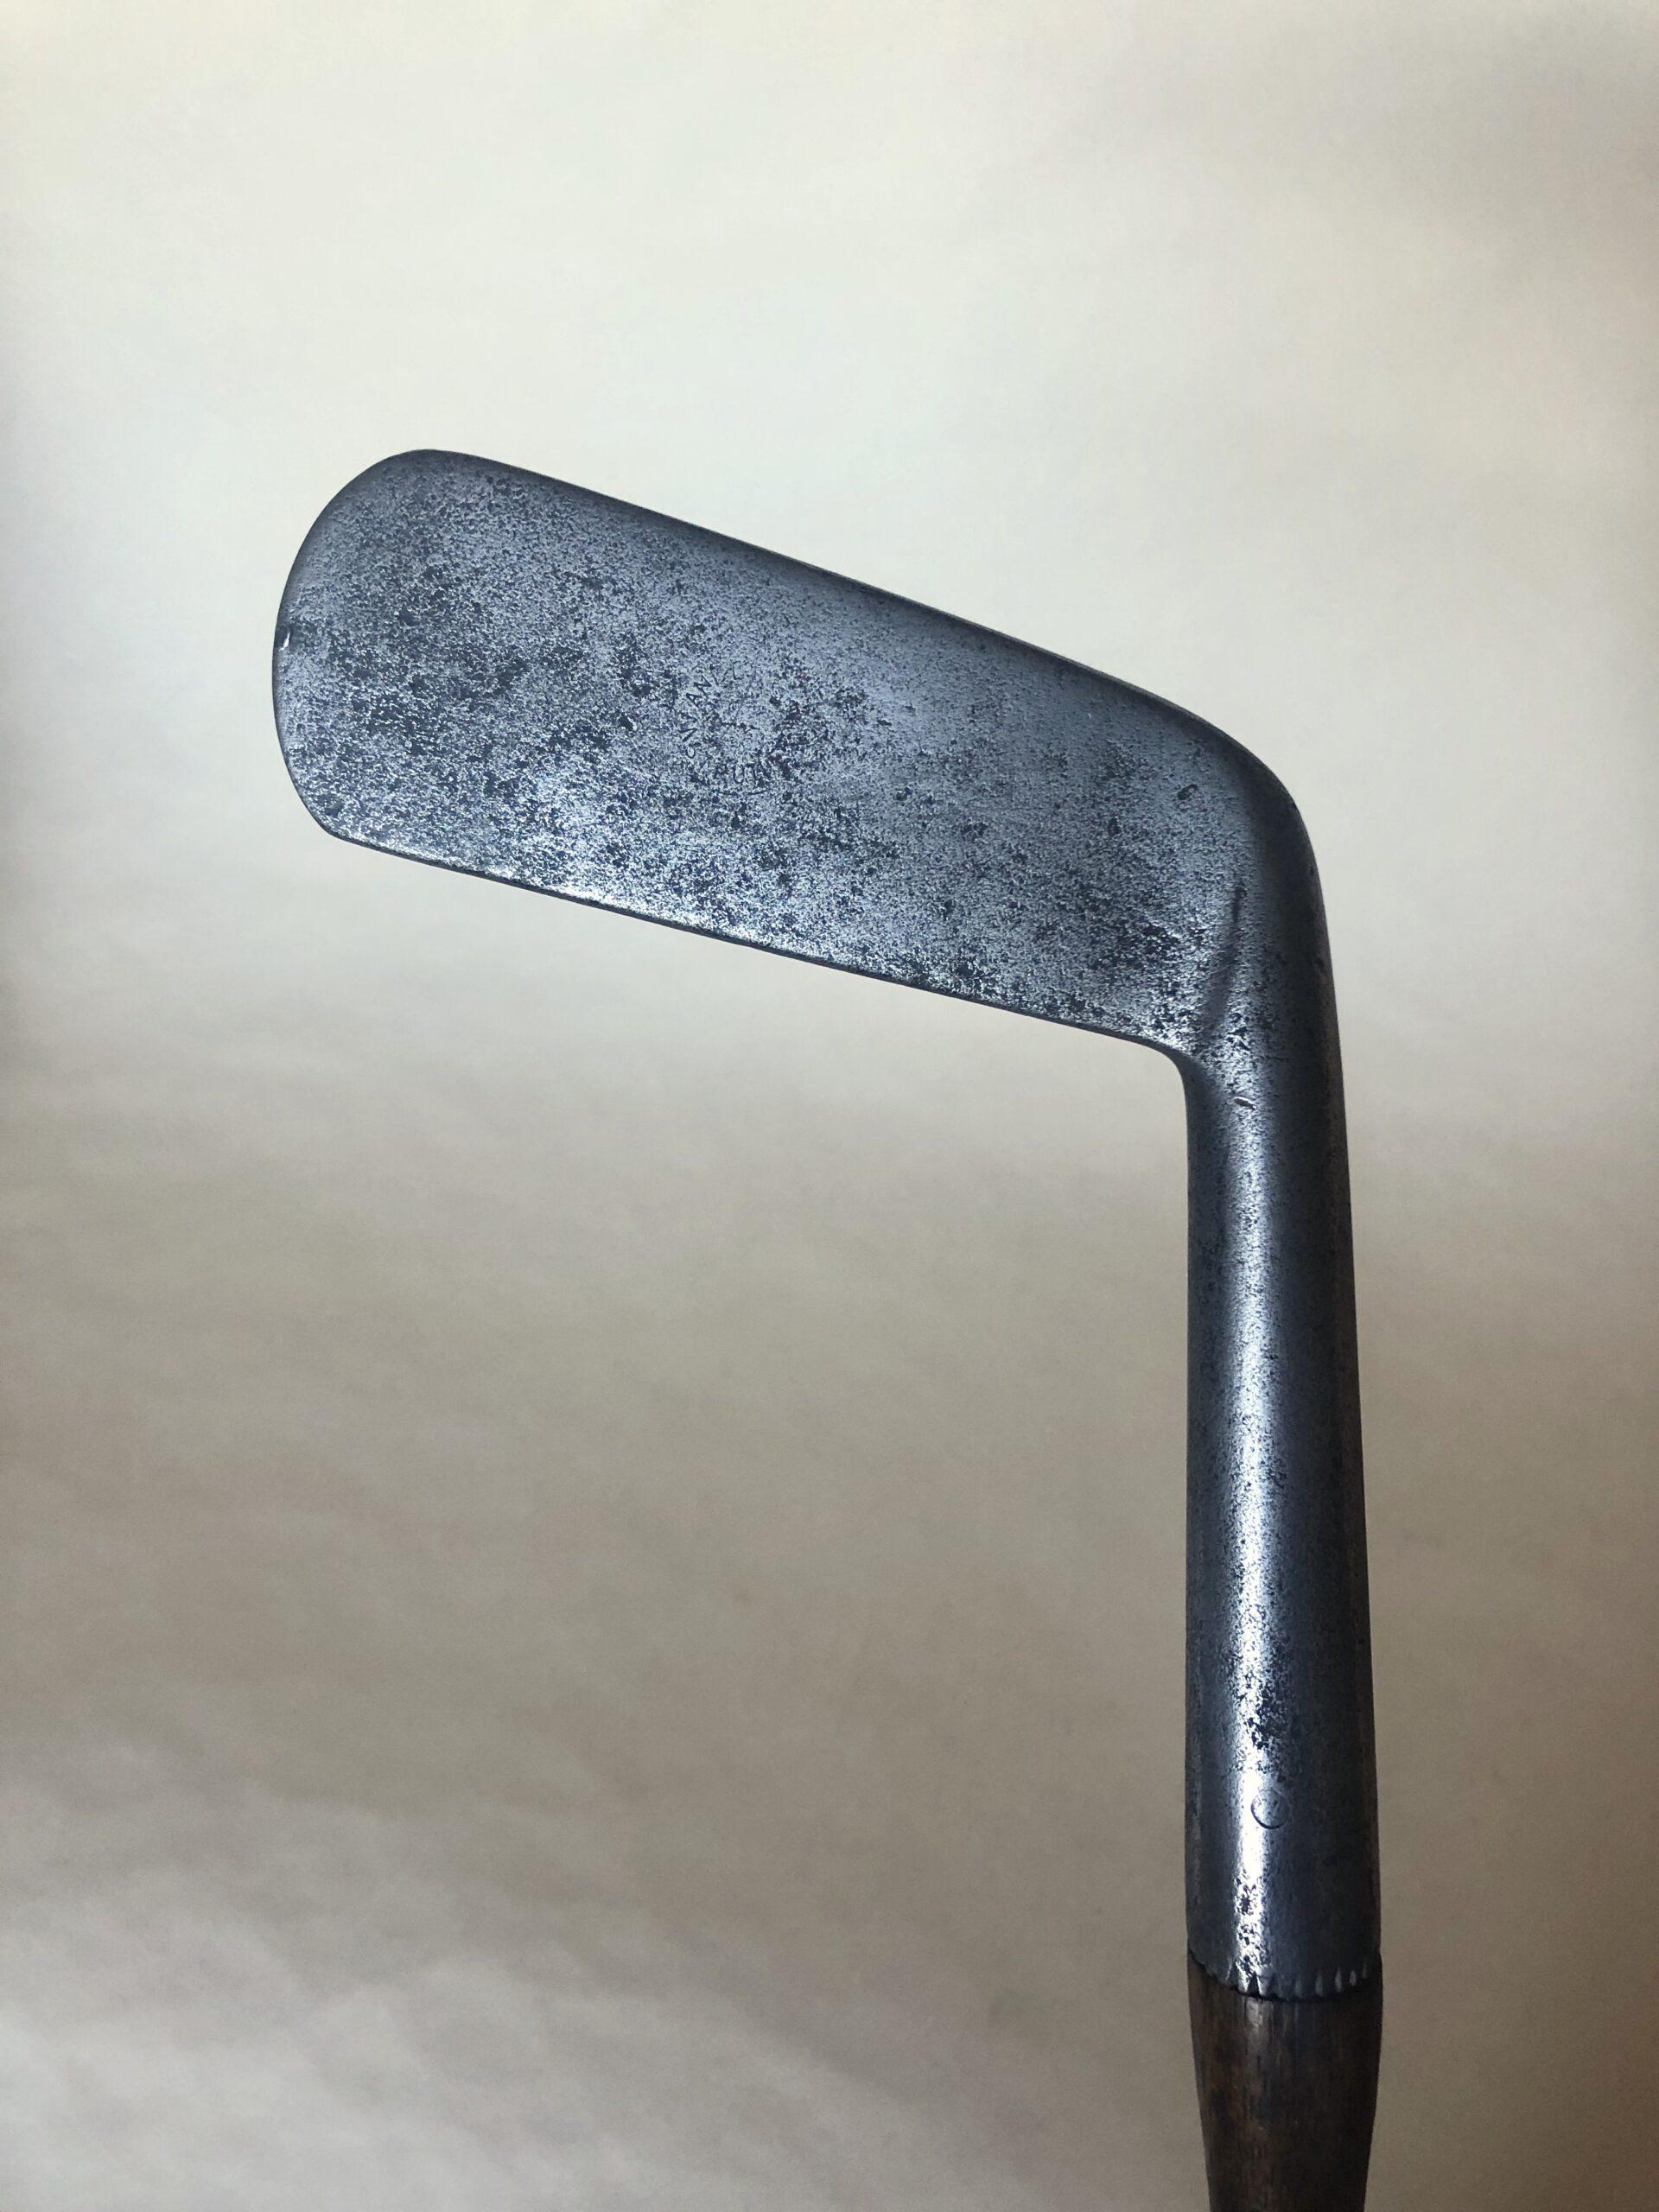 James Anderson blade putter c.1880-85